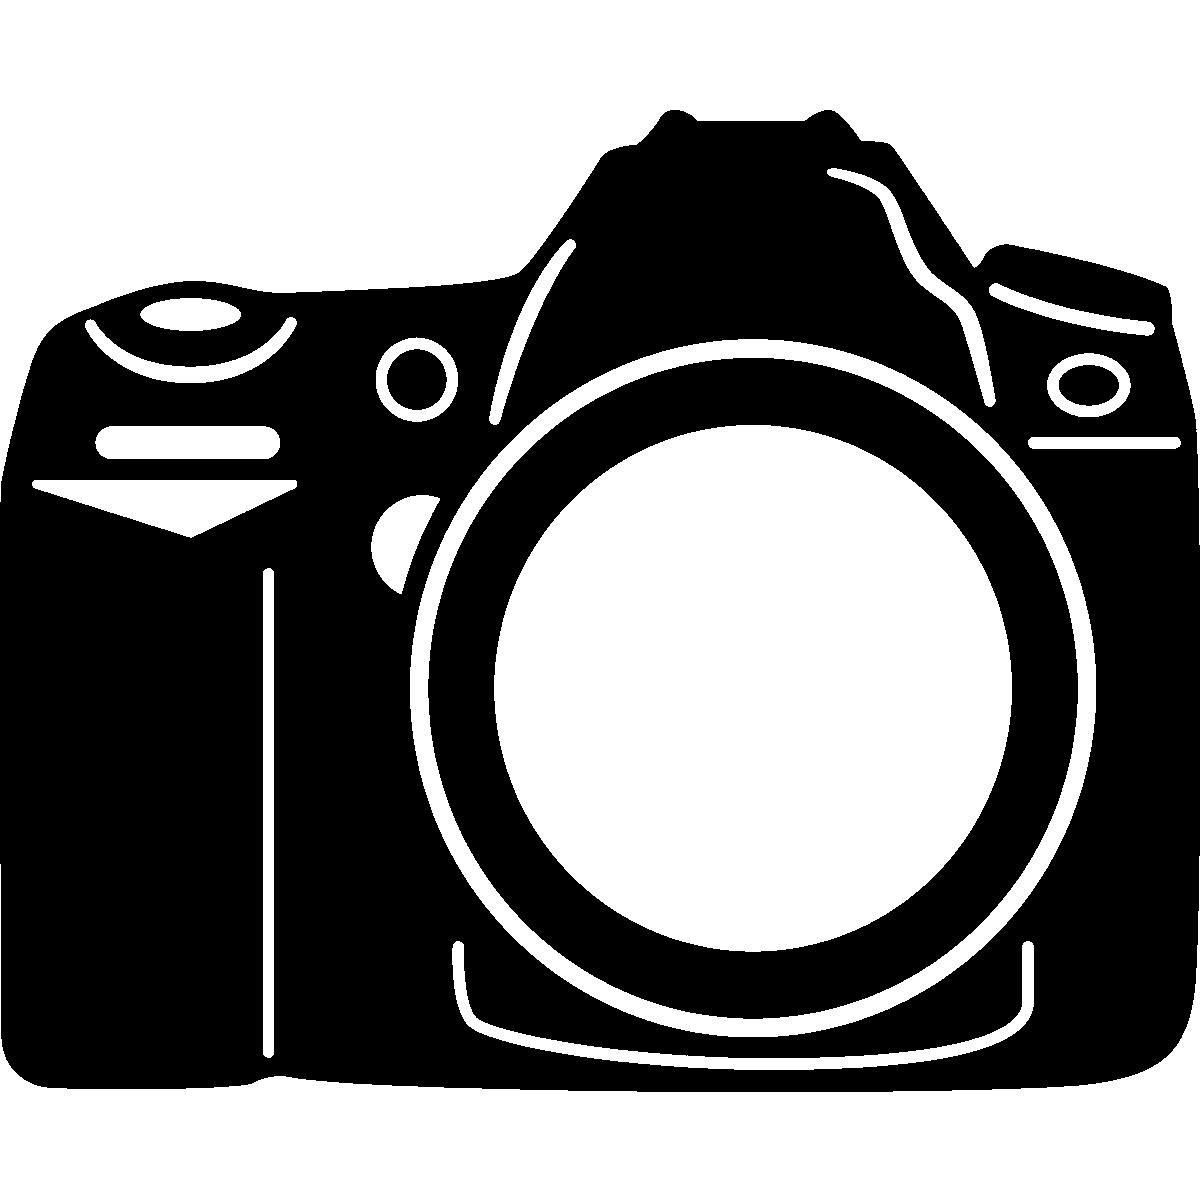 Camera Photography Sticker Clip art.